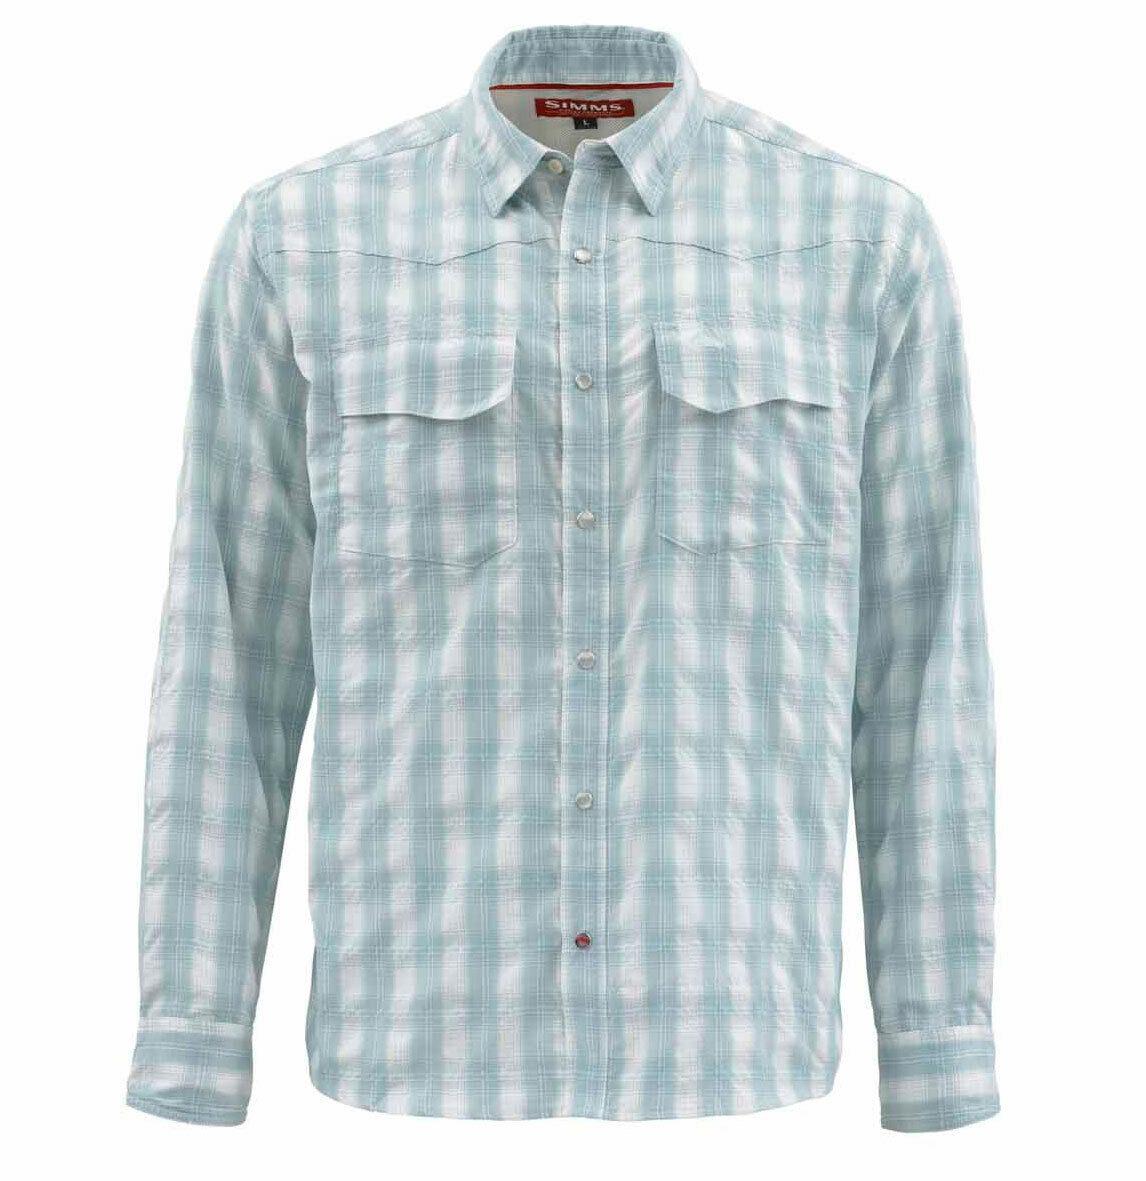 Simms gree cielo LS Shirt  Fog Plaid  Medium  Sale & gratuito US Shipping